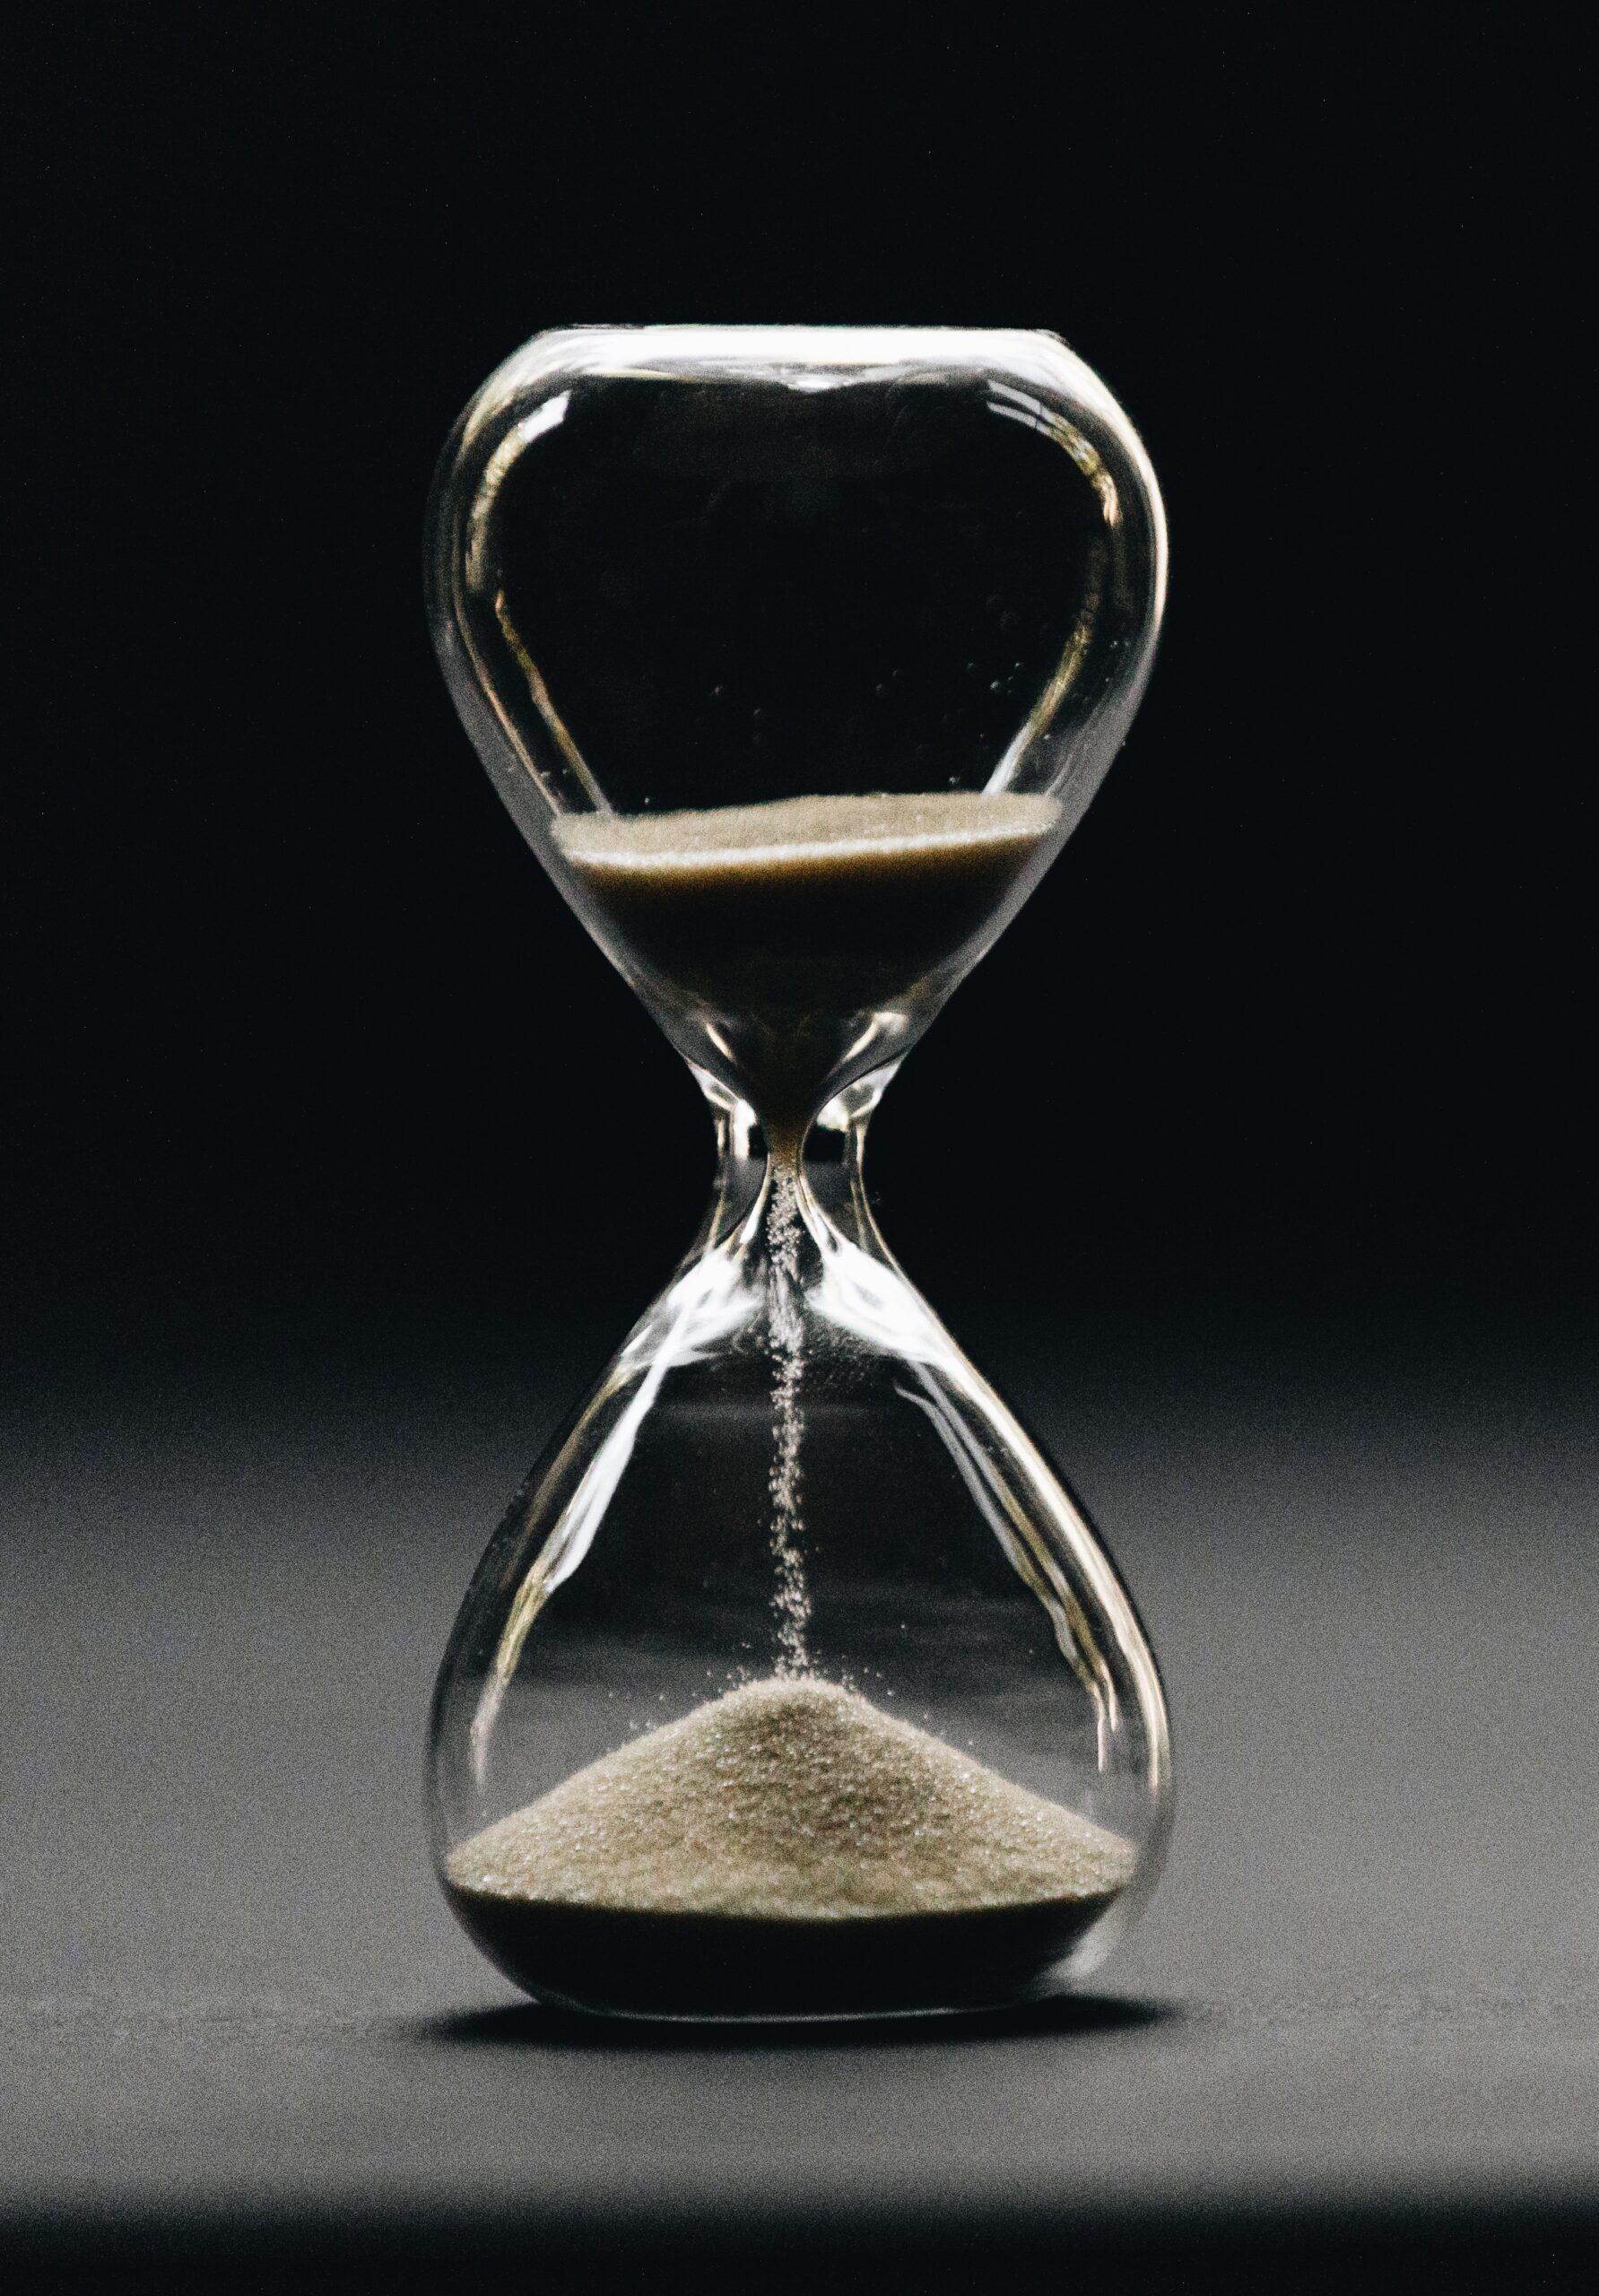 EU Settled Scheme deadline approaching